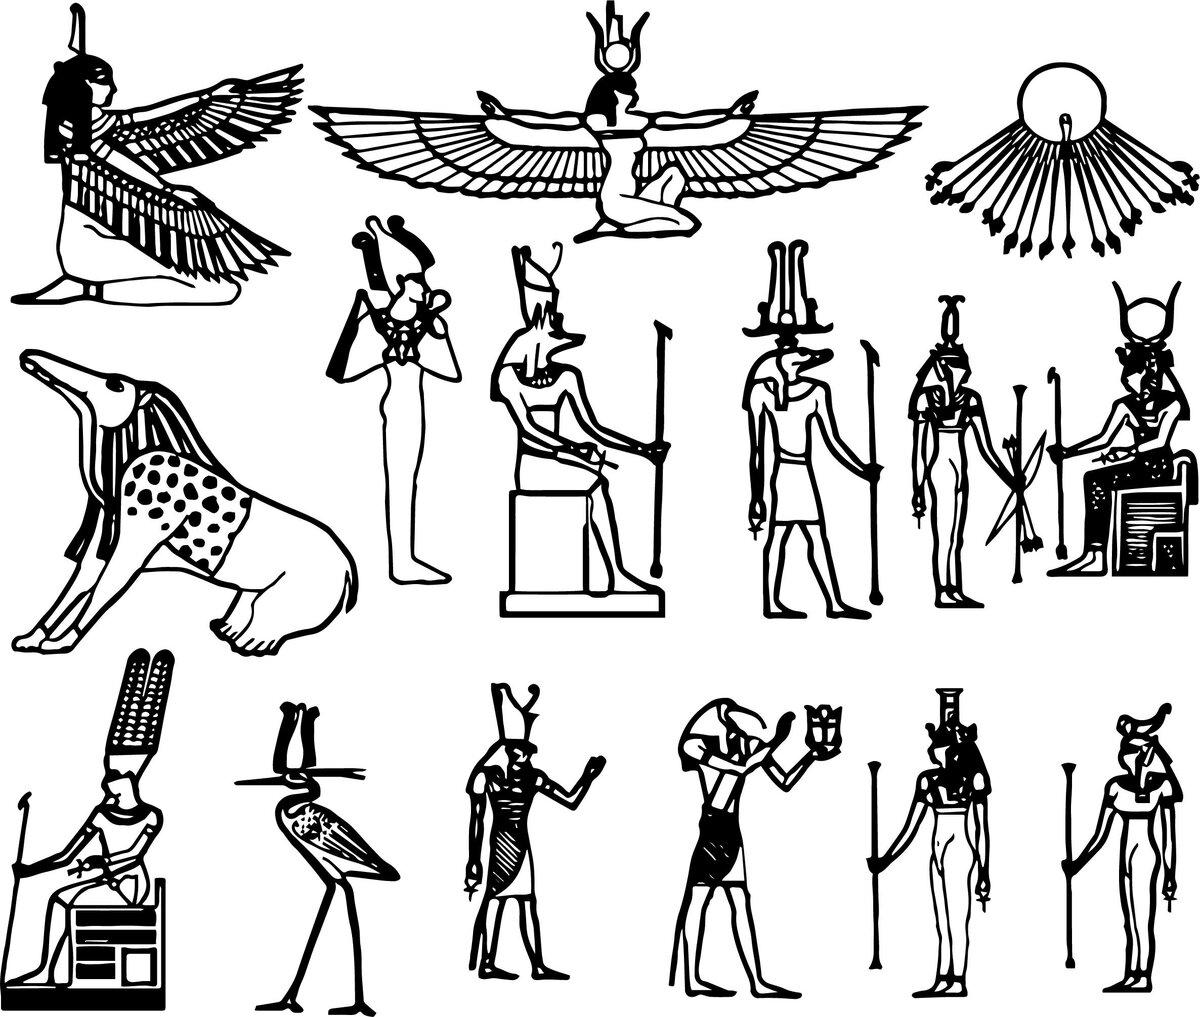 шторки символ египта картинки ход часов каким